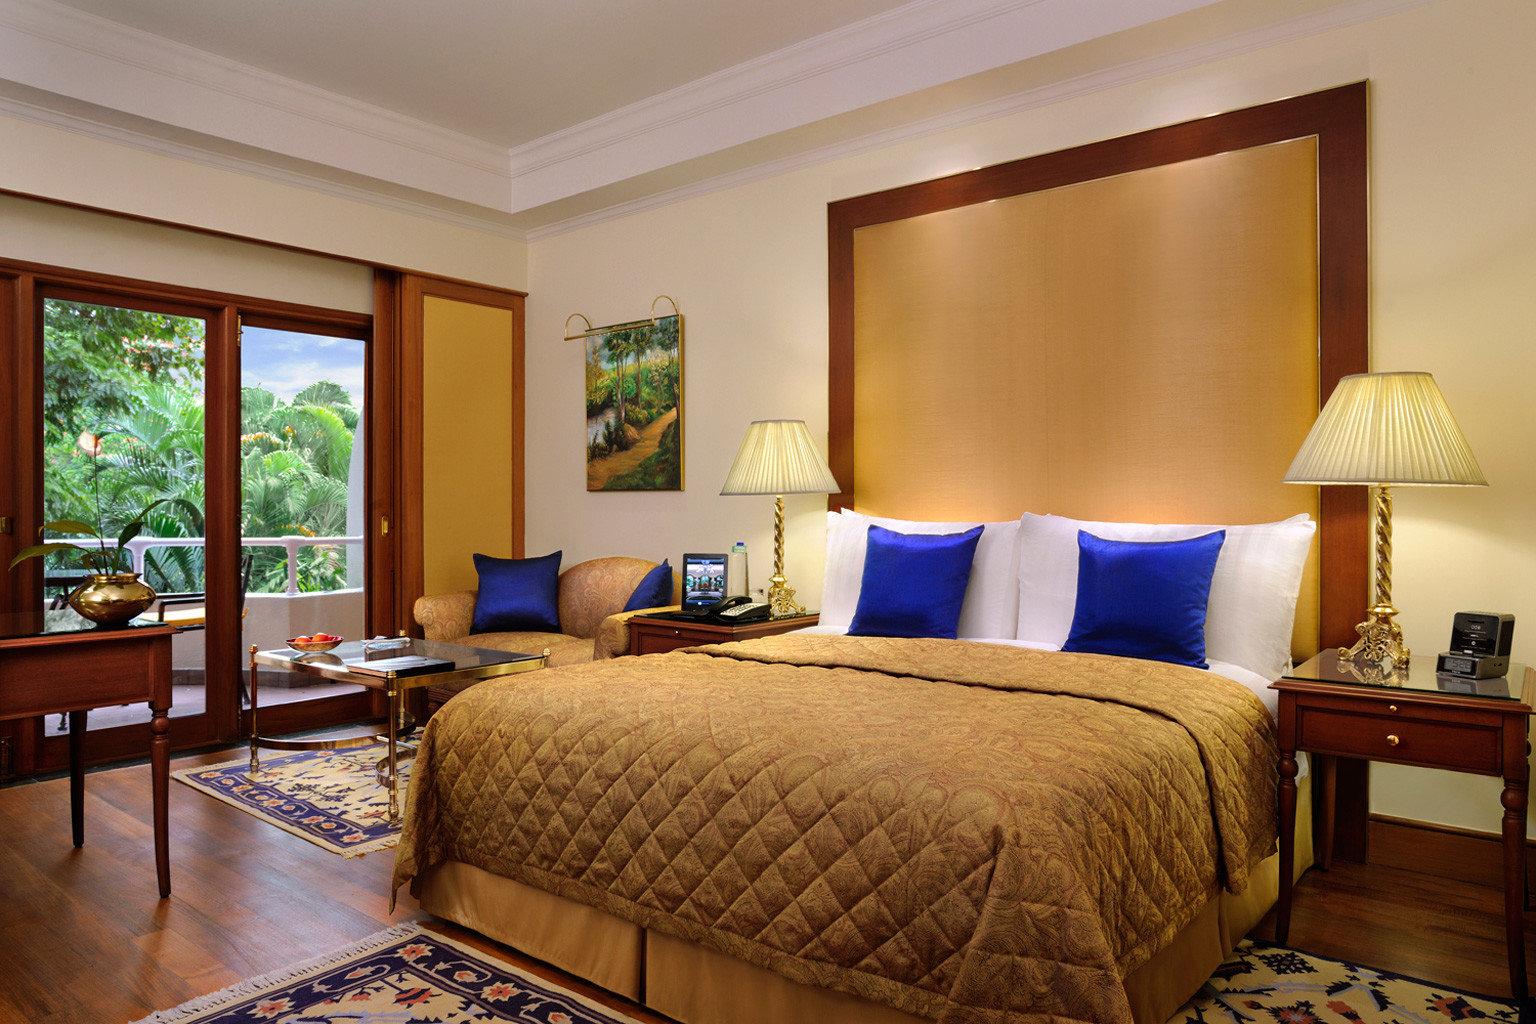 Bedroom Business City Cultural Elegant Luxury Shop Suite sofa property cottage home hardwood living room Villa Resort condominium containing